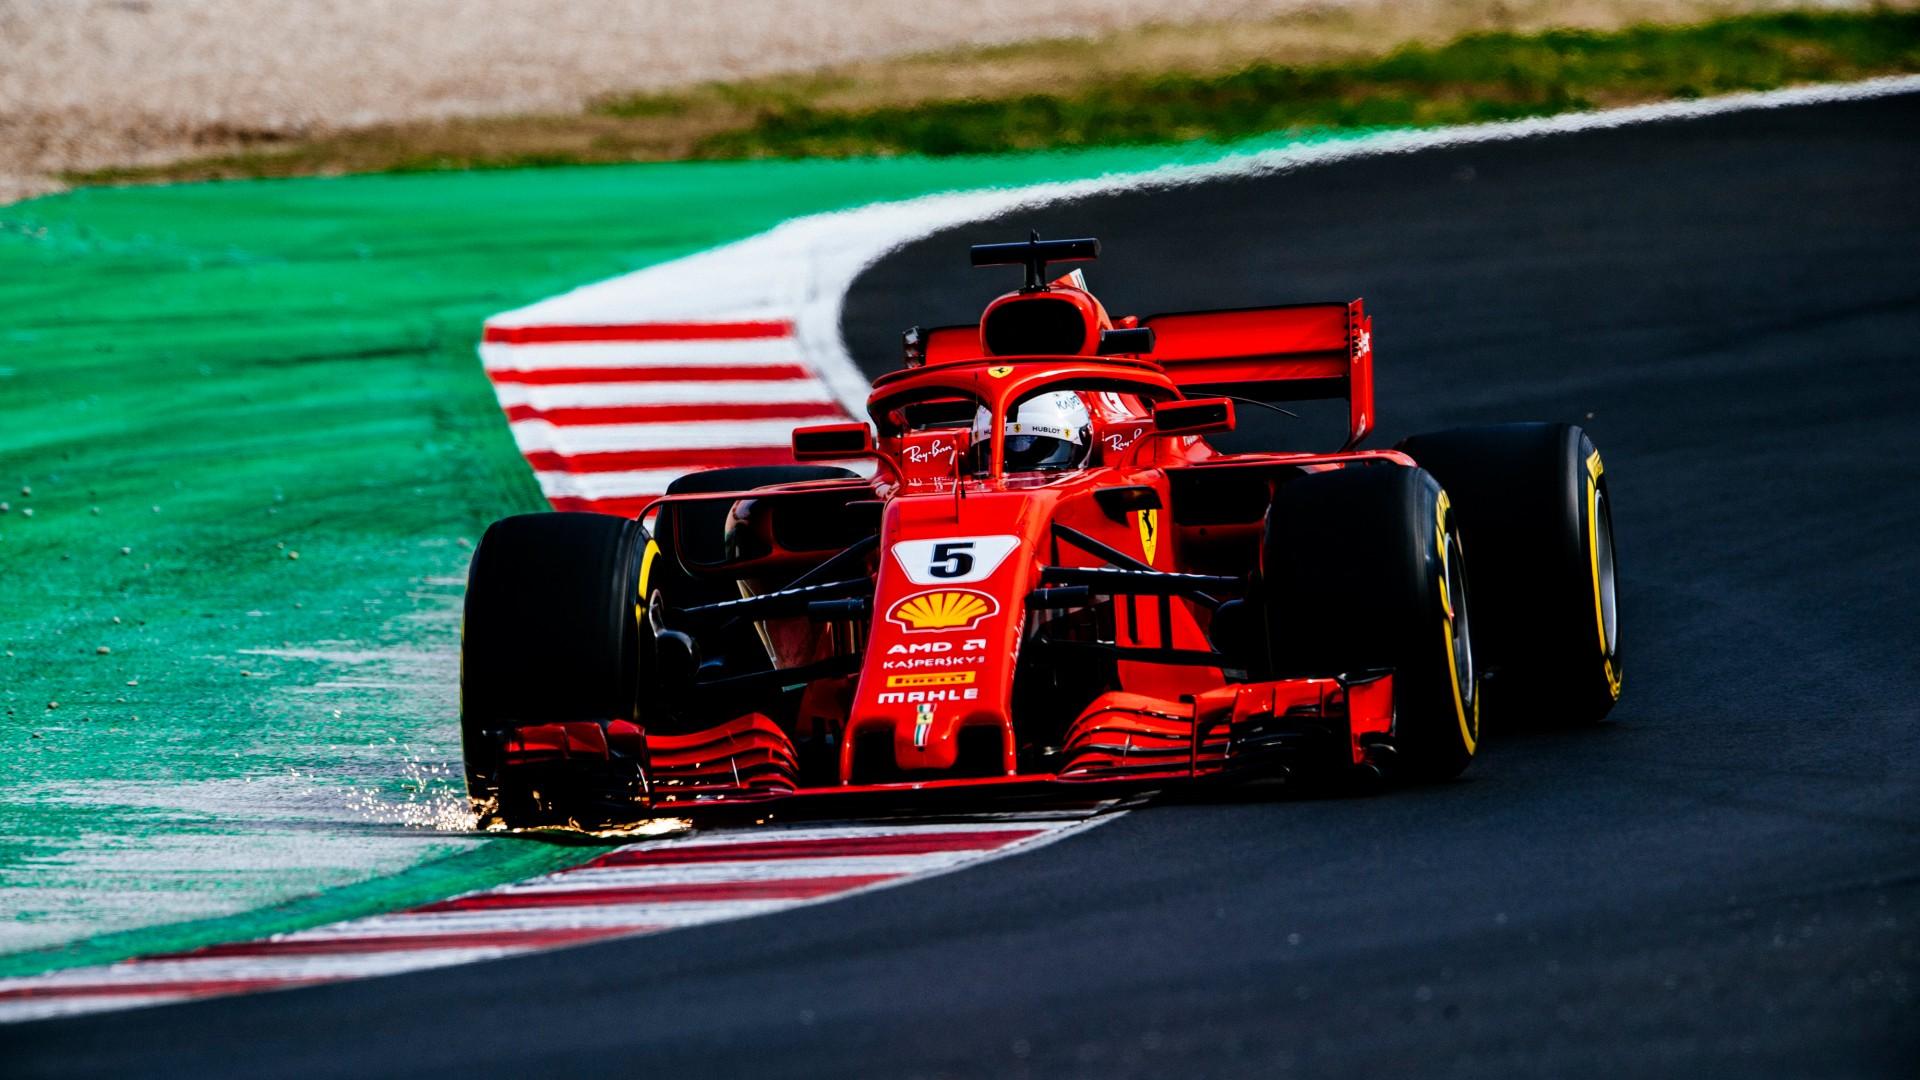 Car Wallpaper Hd Iphone 4 2018 Ferrari Sf71h F1 Formula 1 4k 2 Wallpaper Hd Car